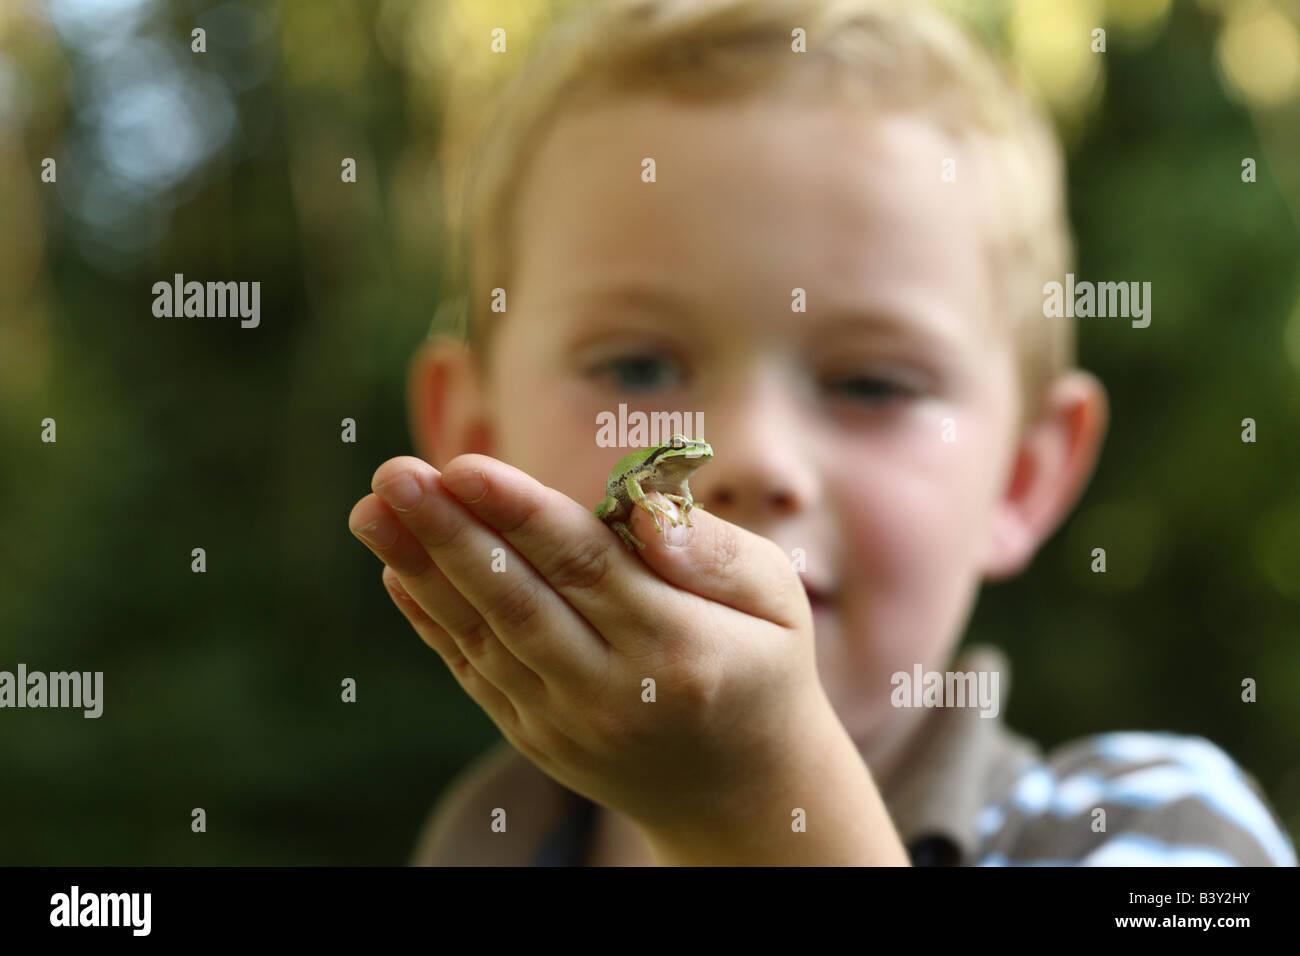 Joven celebración pequeña rana de árbol Imagen De Stock